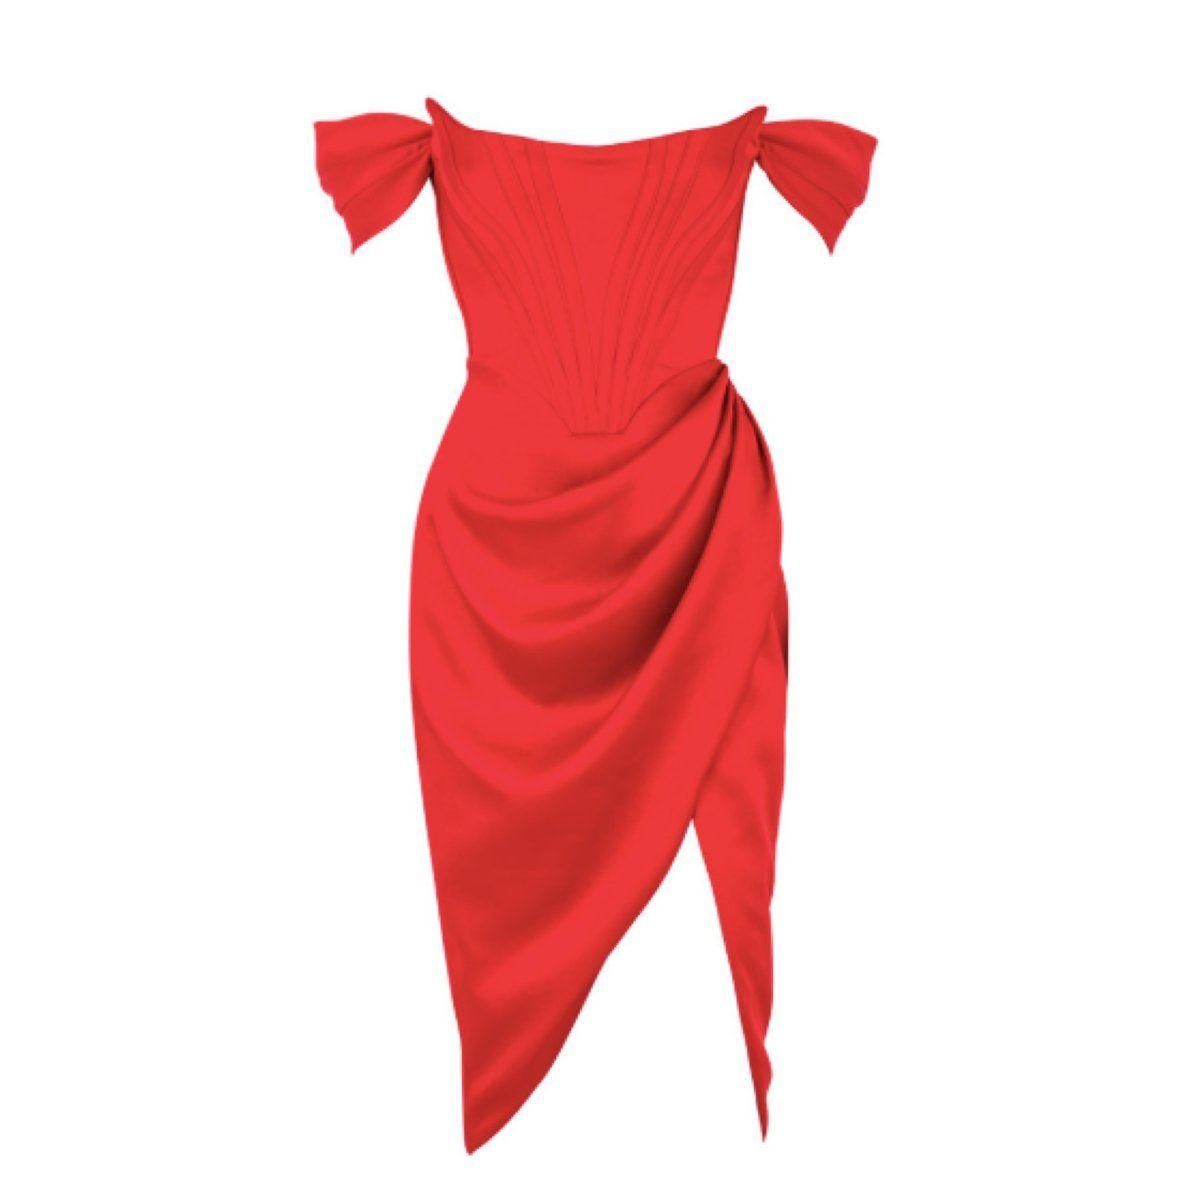 Red Off The Shoulder Corset Midi Dress In 2021 Corset Midi Dress Red Midi Dress High Low Lace Dress [ 1200 x 1200 Pixel ]